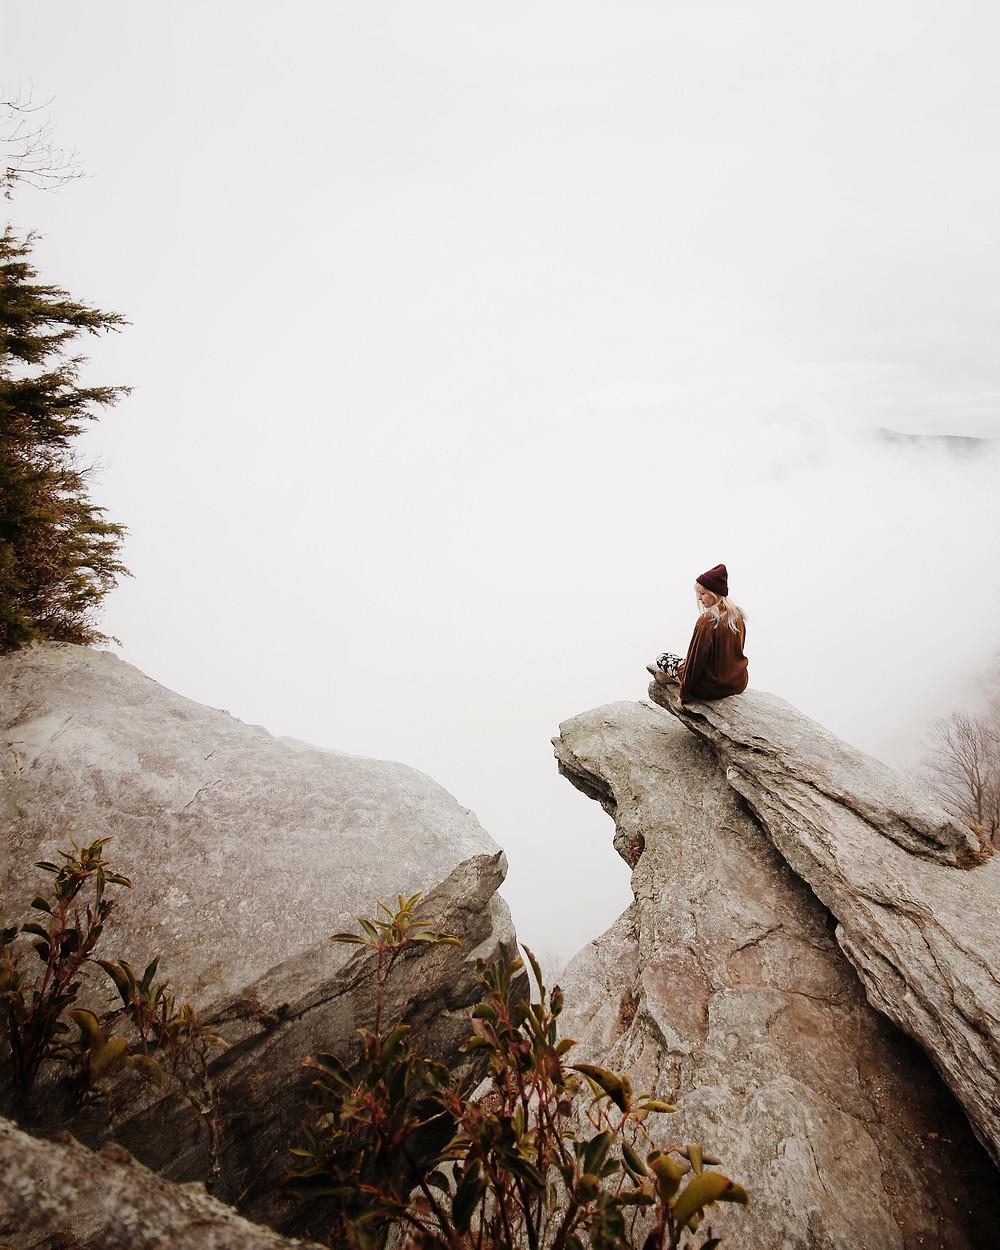 meditation seclusion